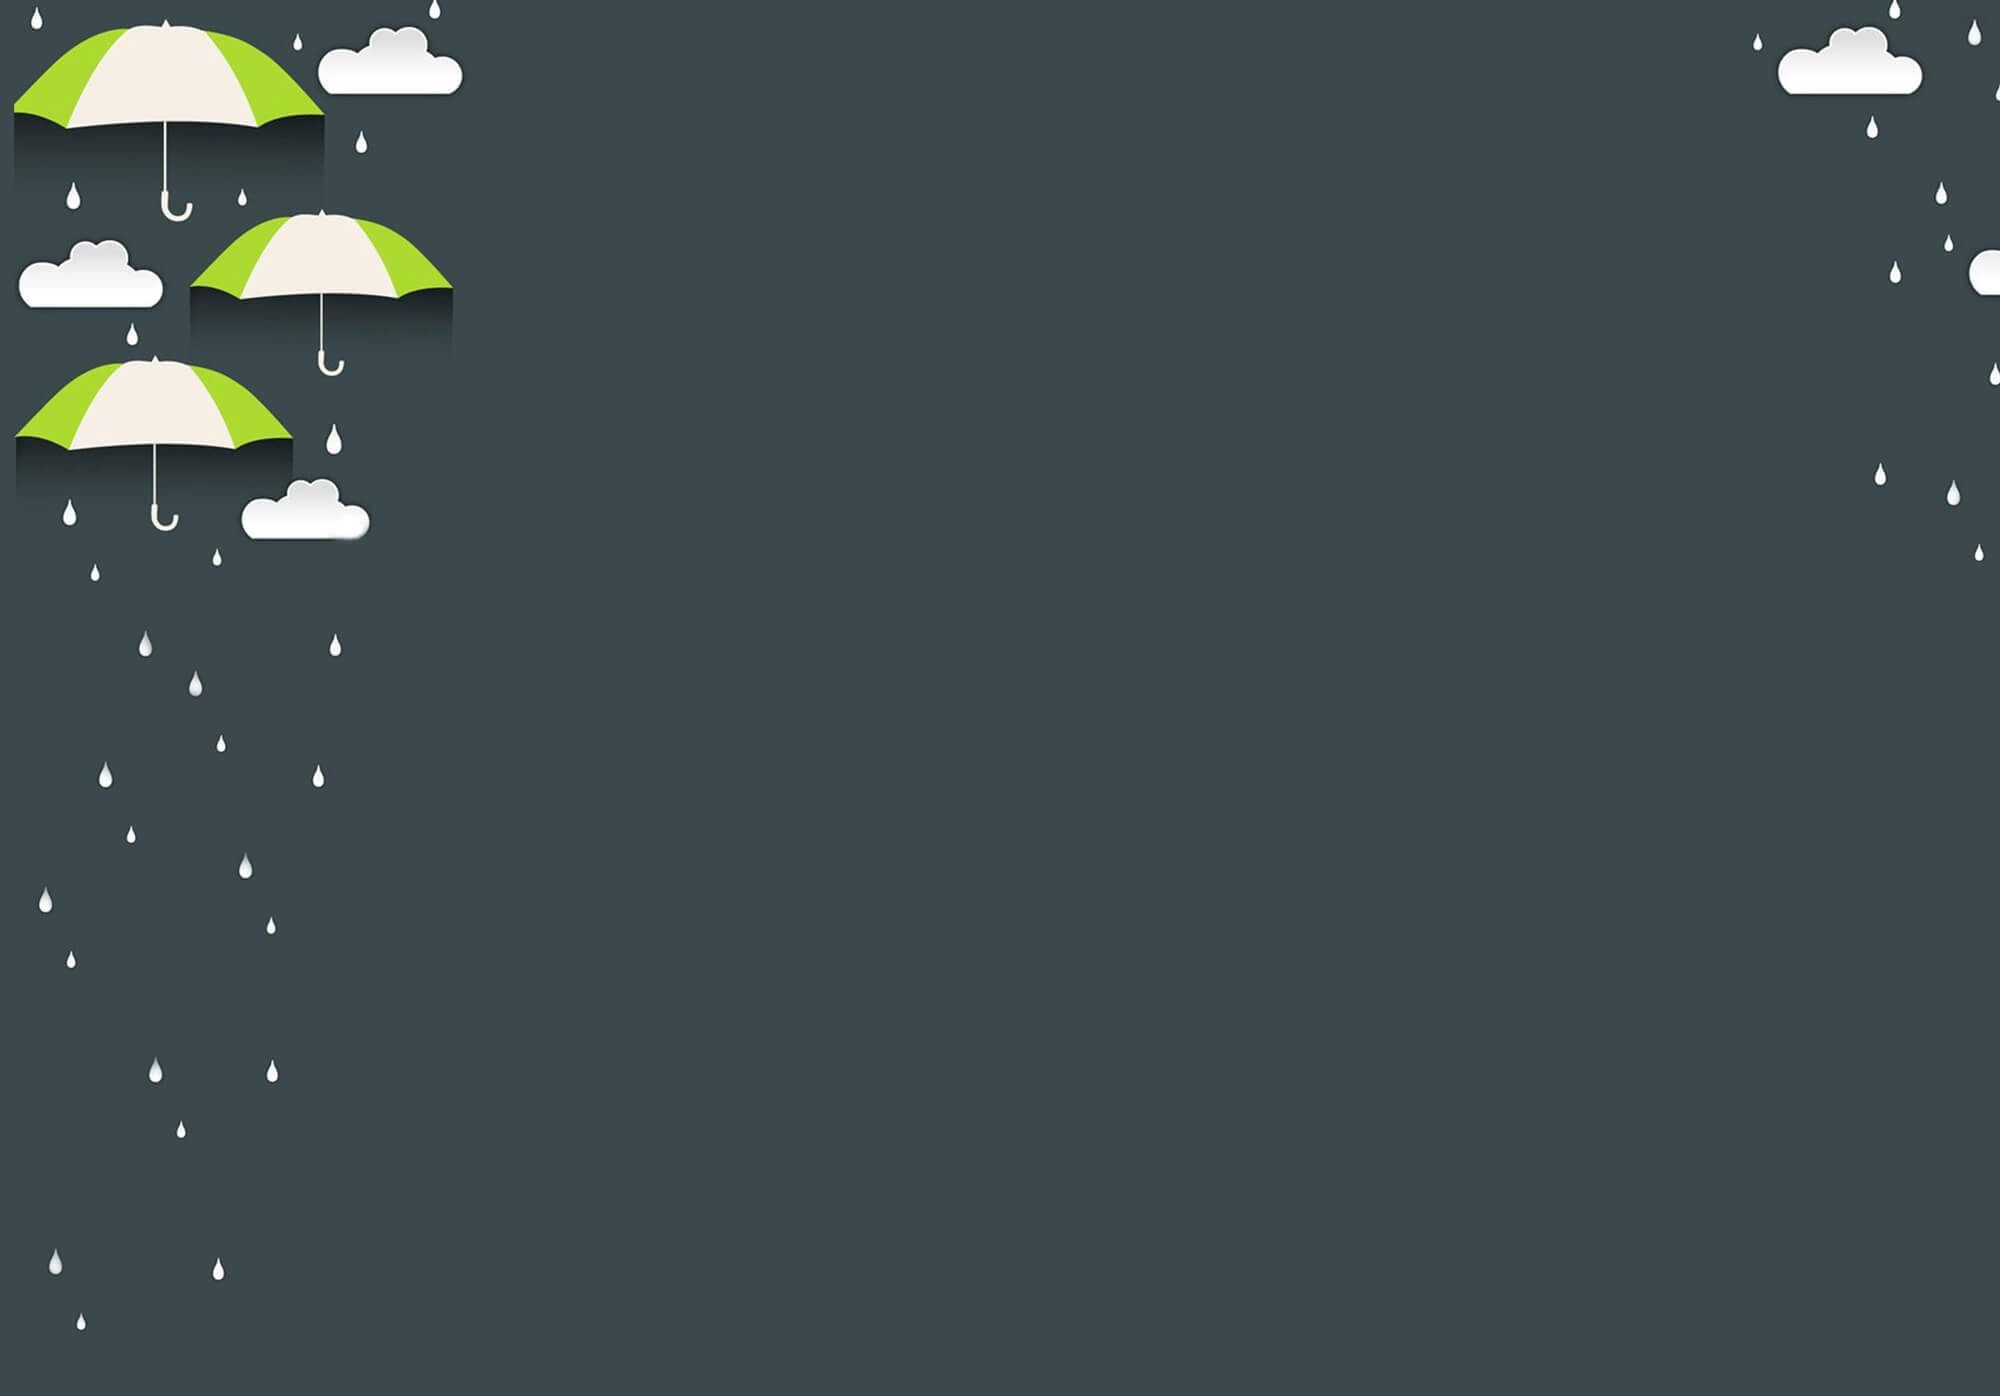 Background cho PowerPoint ô che mưa